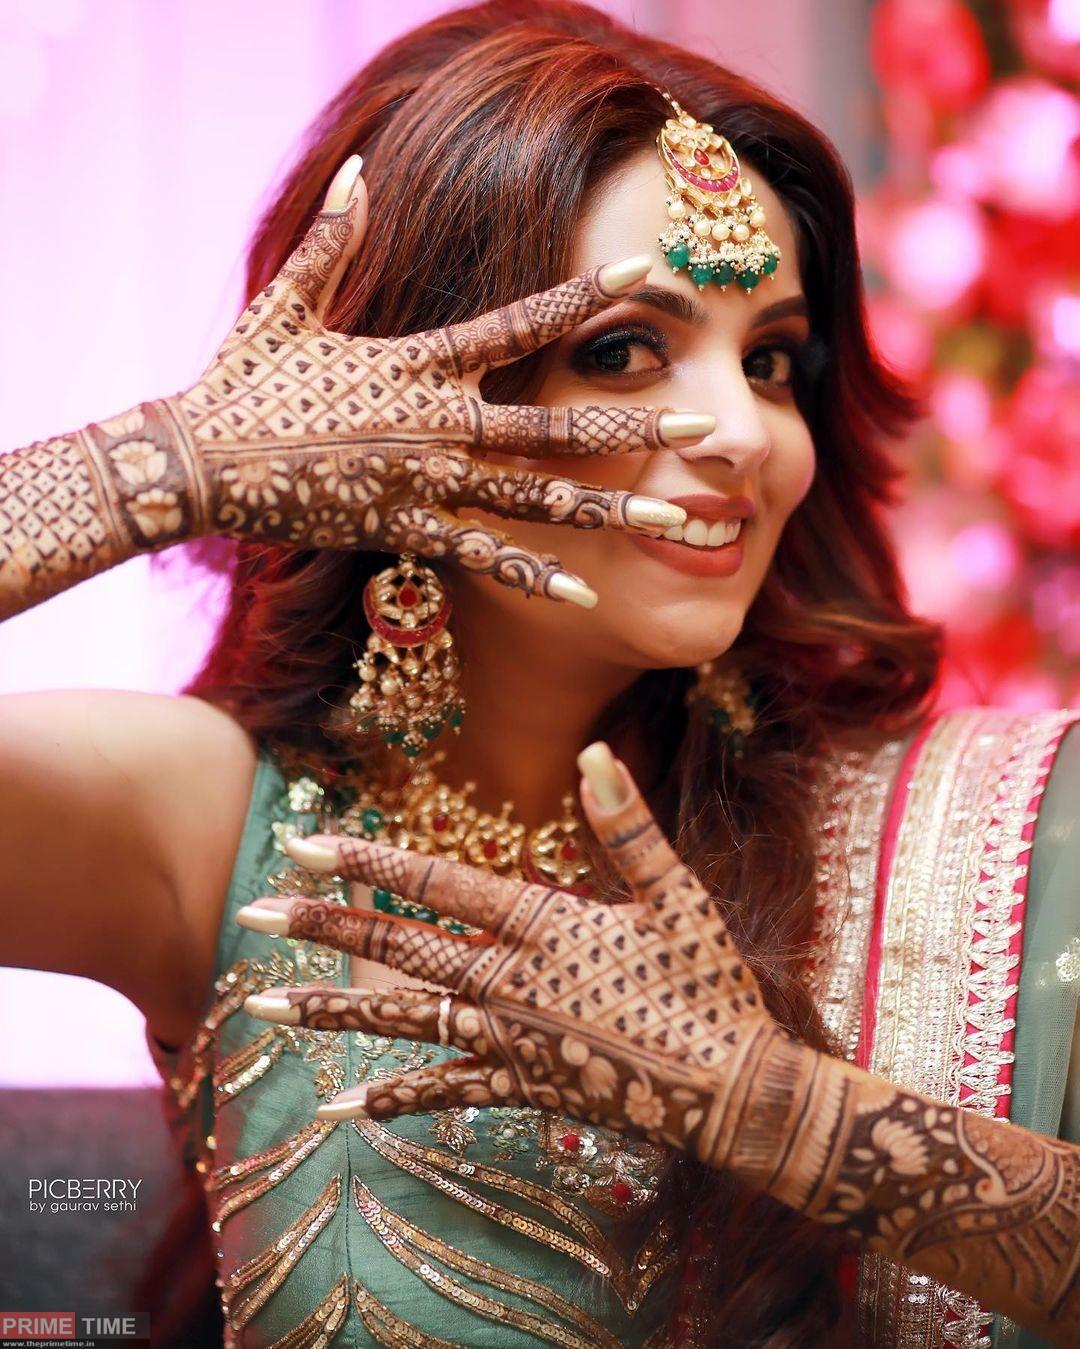 Sugandha Mishra and Sanket Bhosale got married